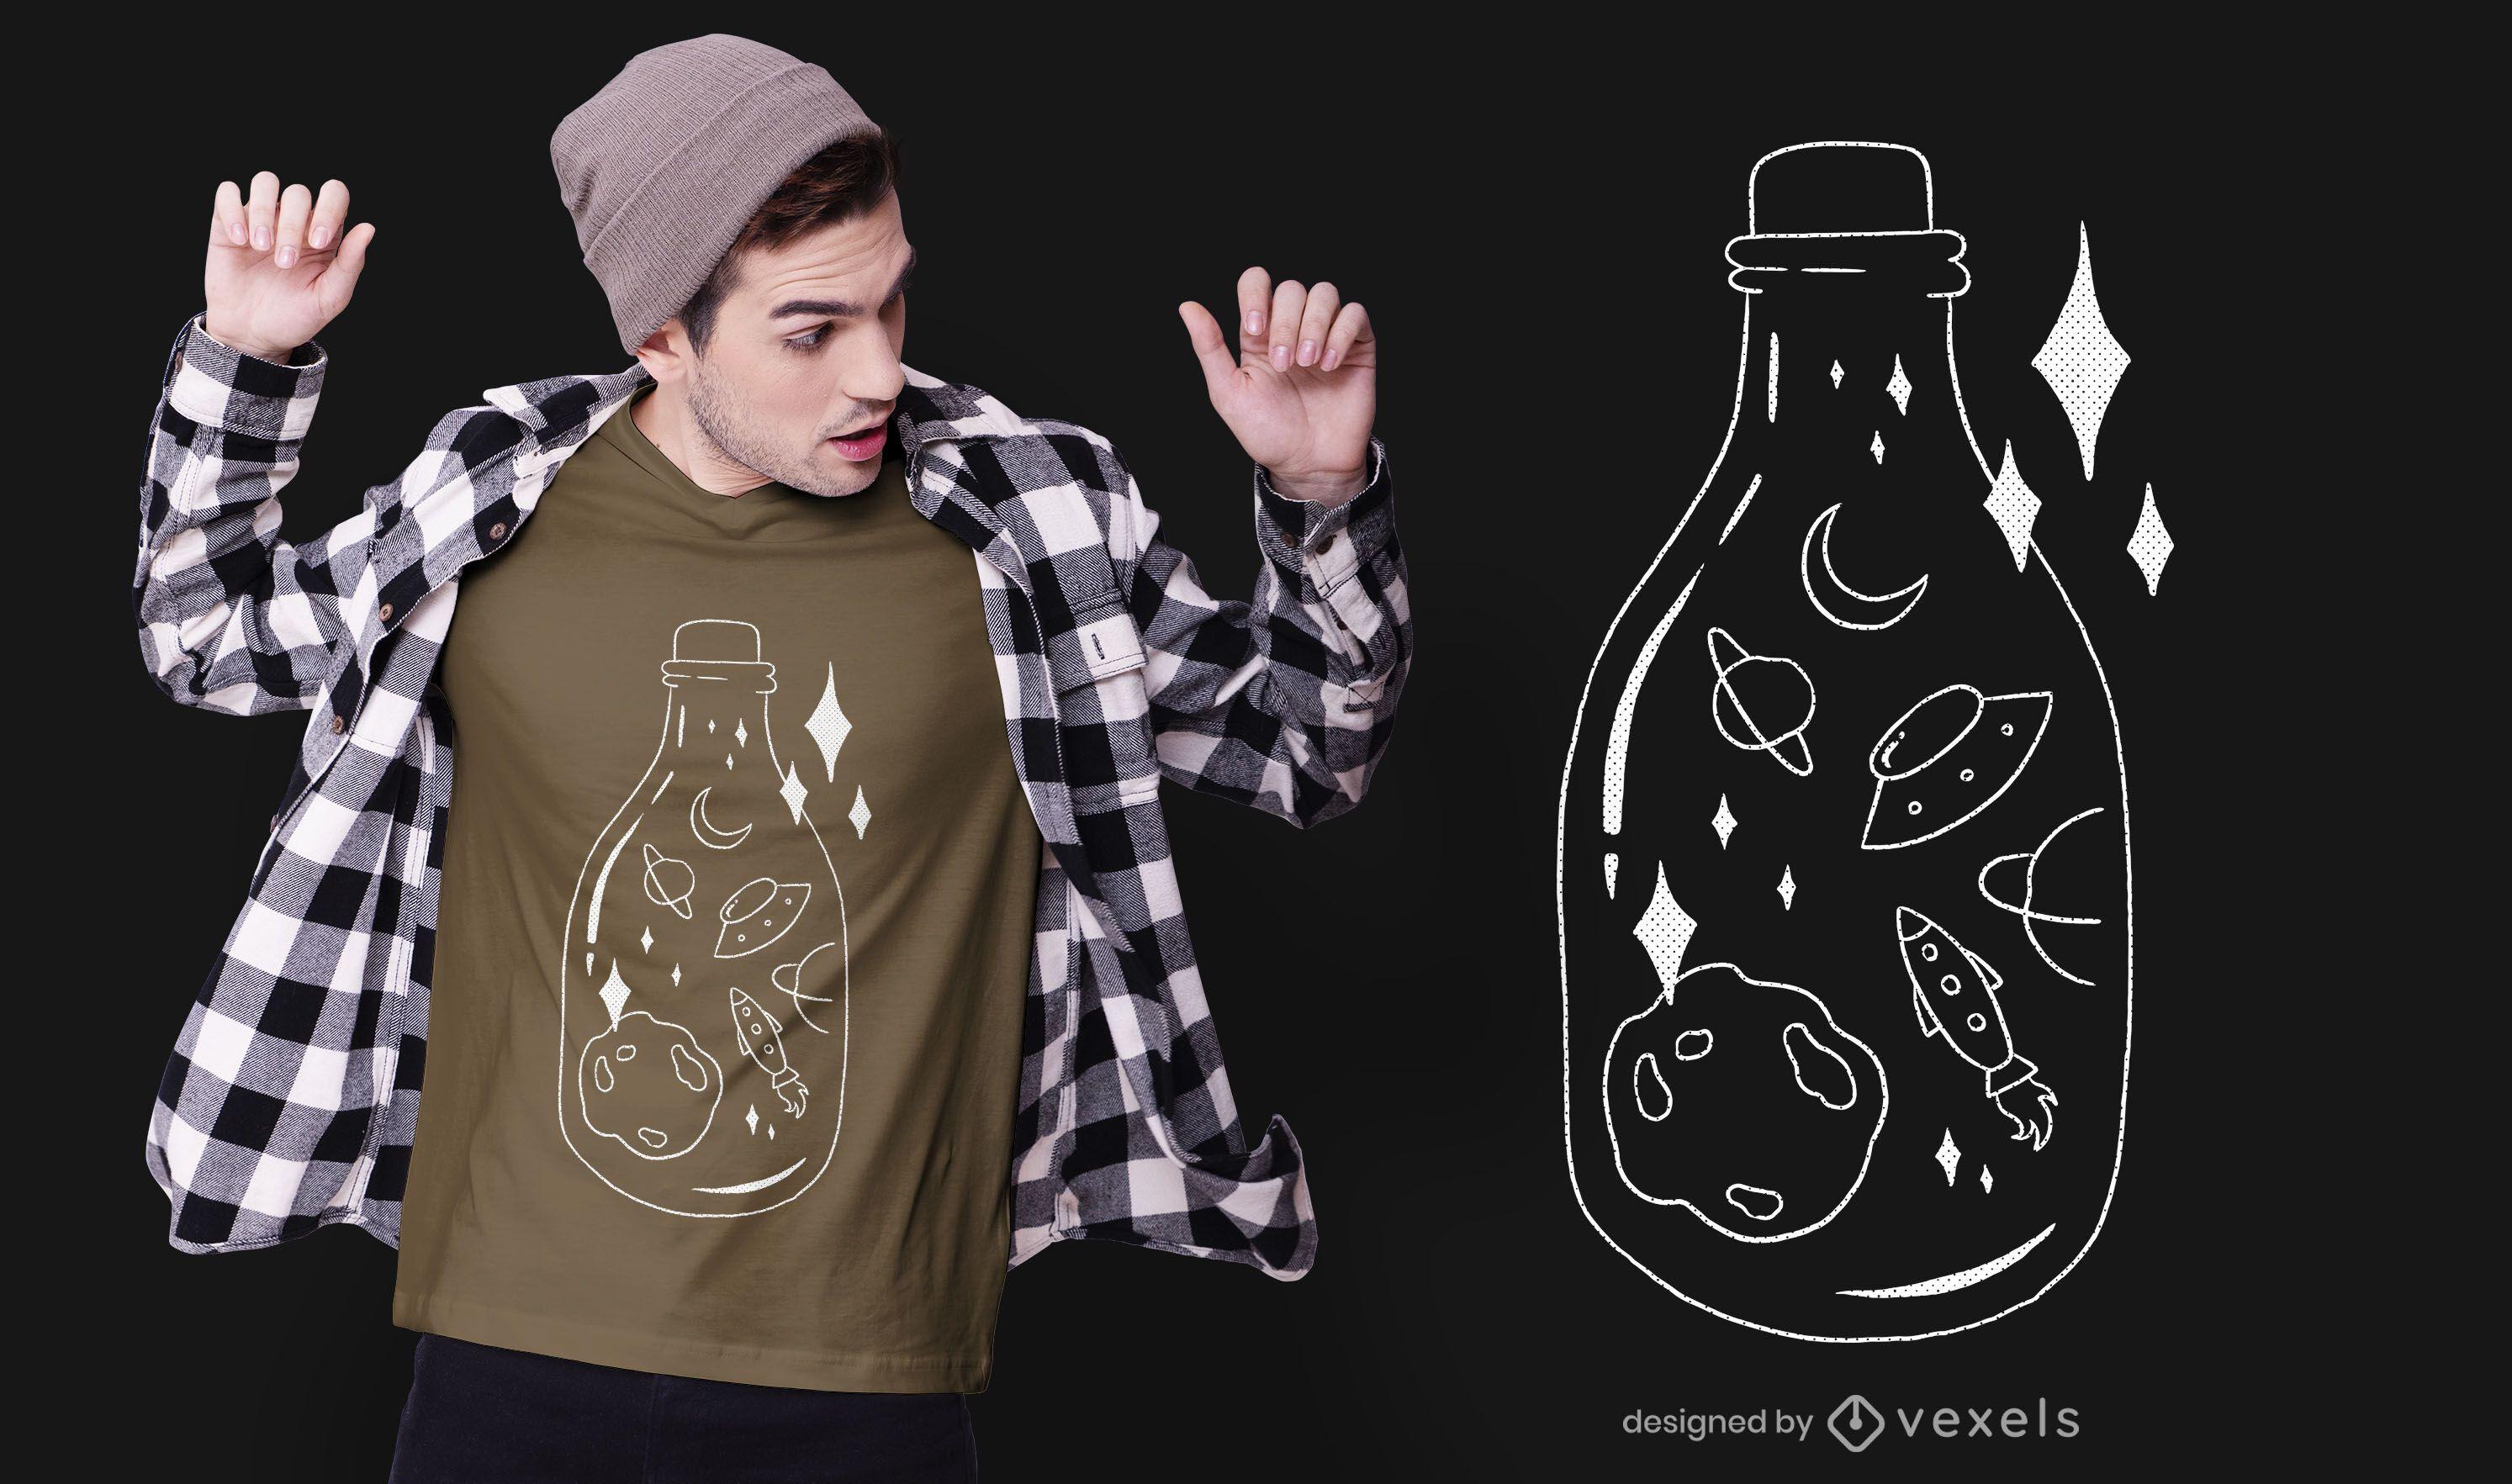 Space bottle t-shirt design